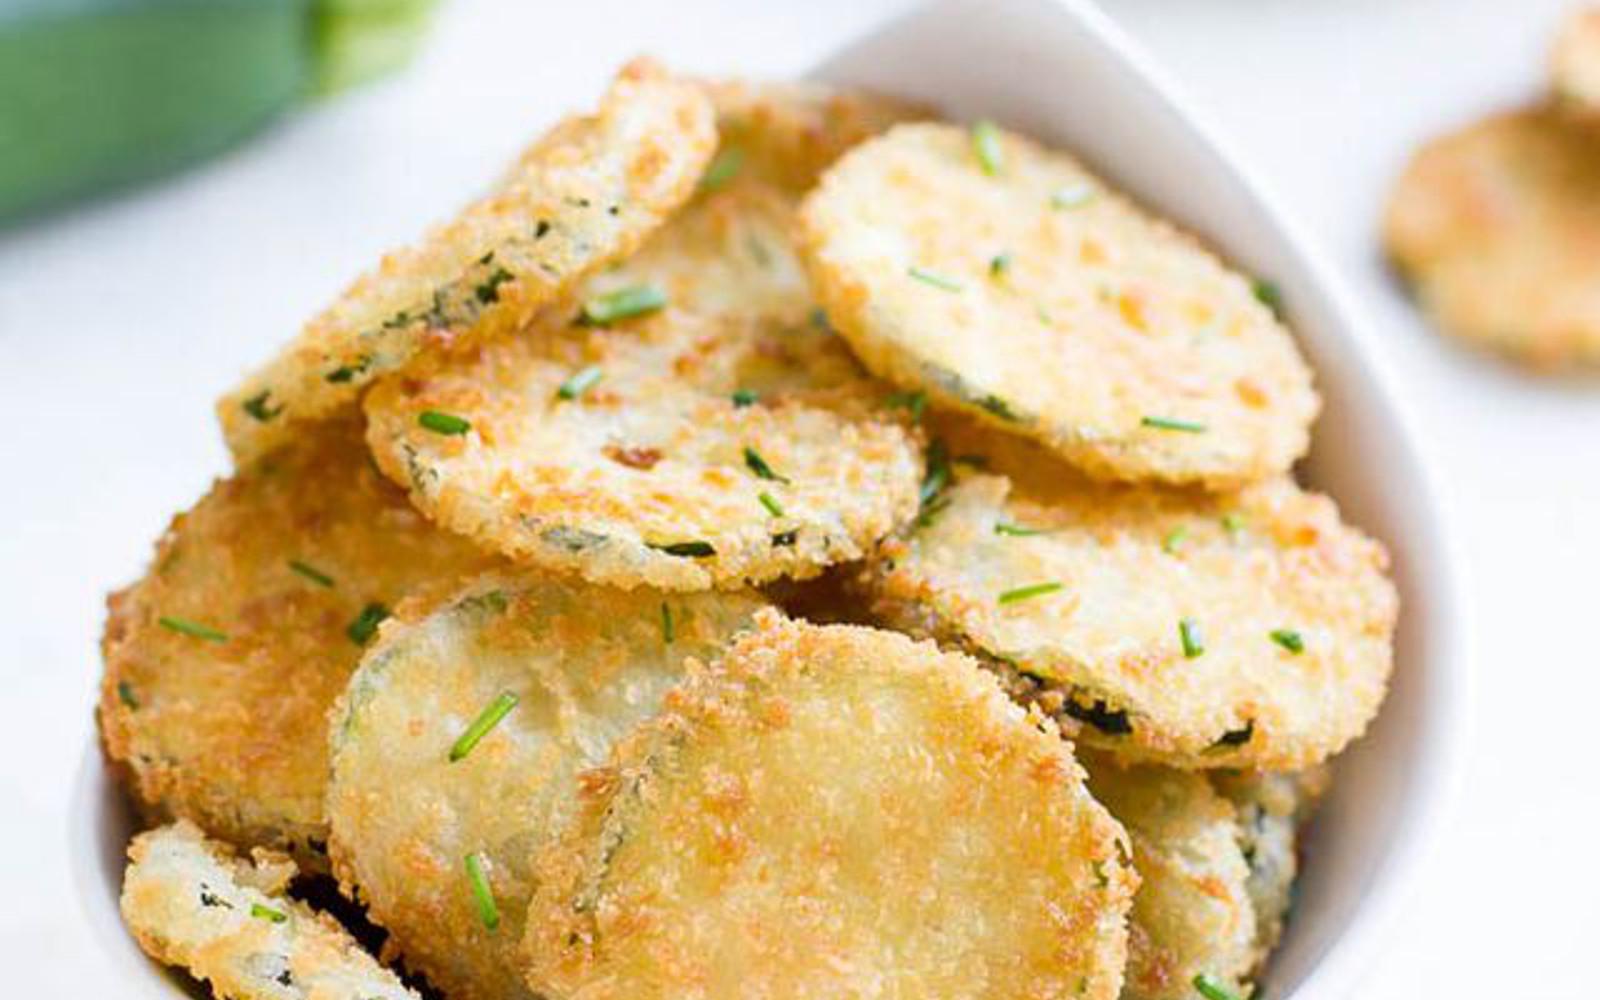 panko crusted zucchini chips